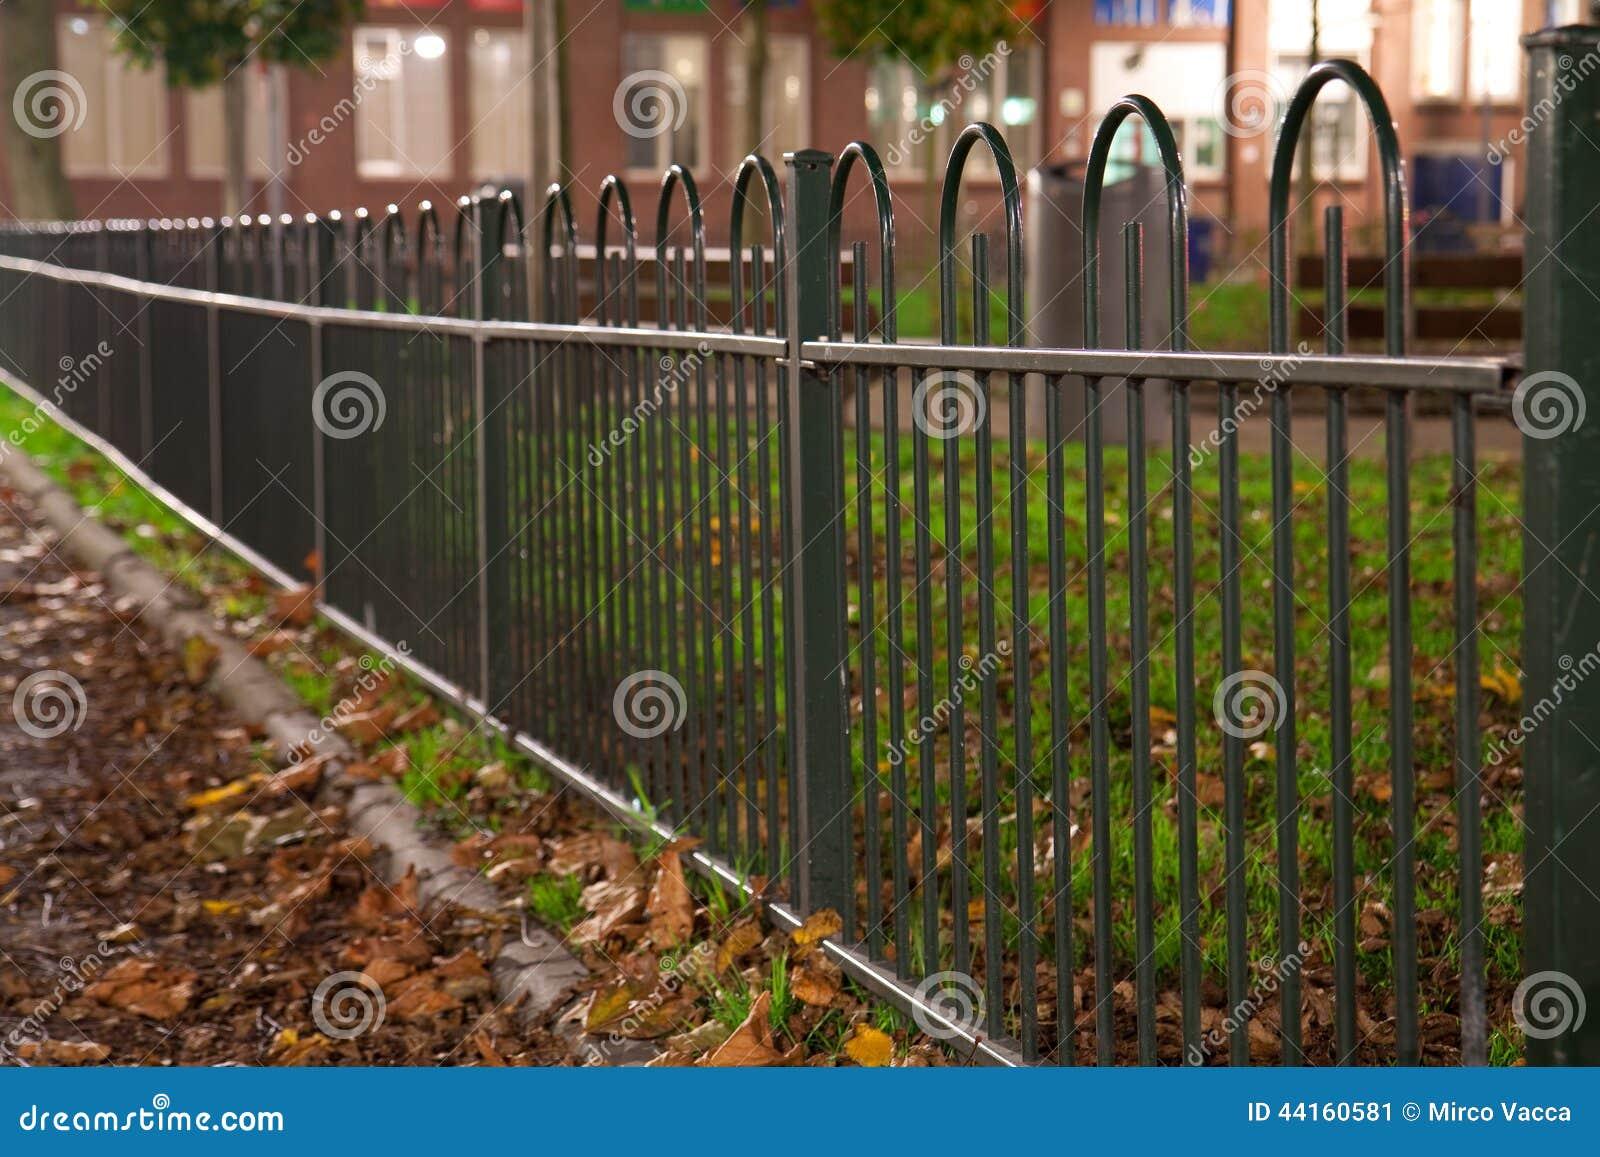 Grüner Zaun stockbild Bild von park metall abend bürgersteig